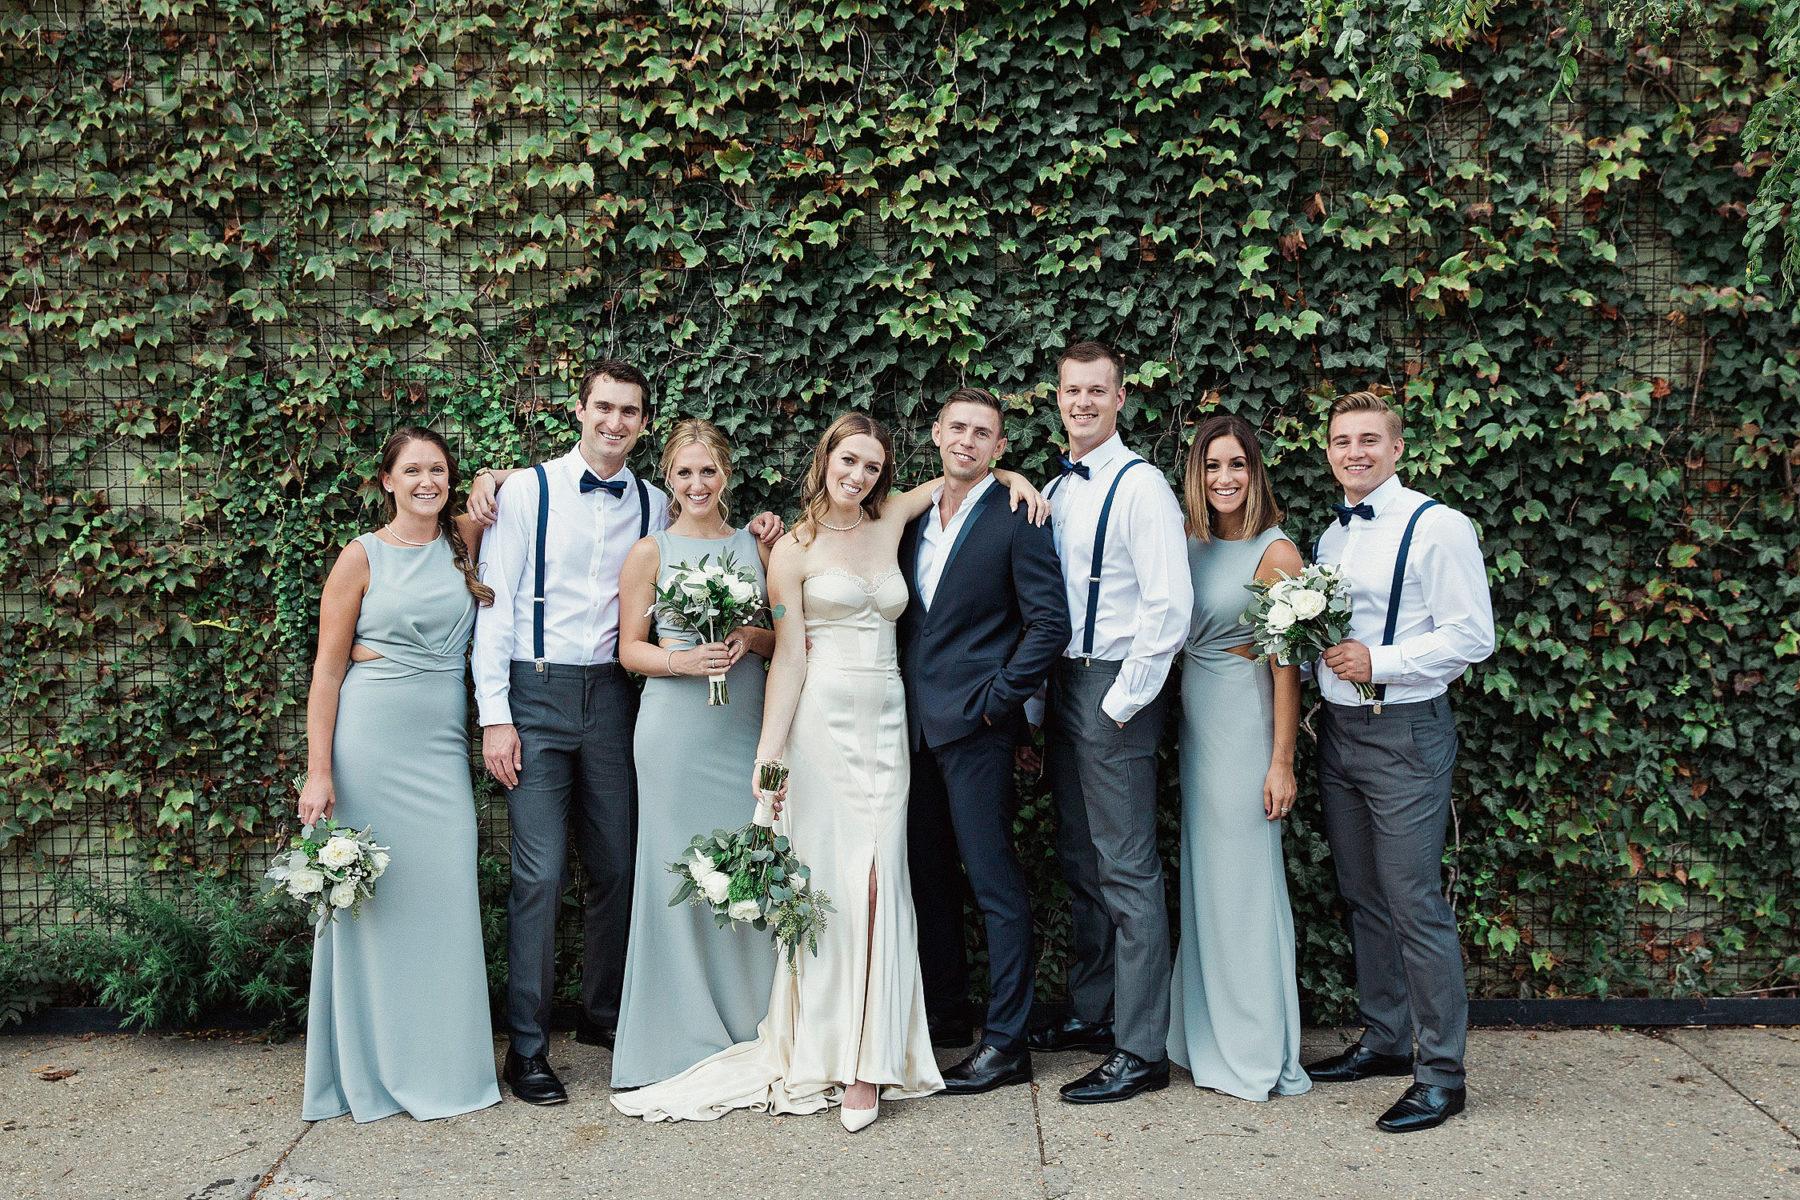 Green Building Wedding Party Photos - Top Wedding Photographers